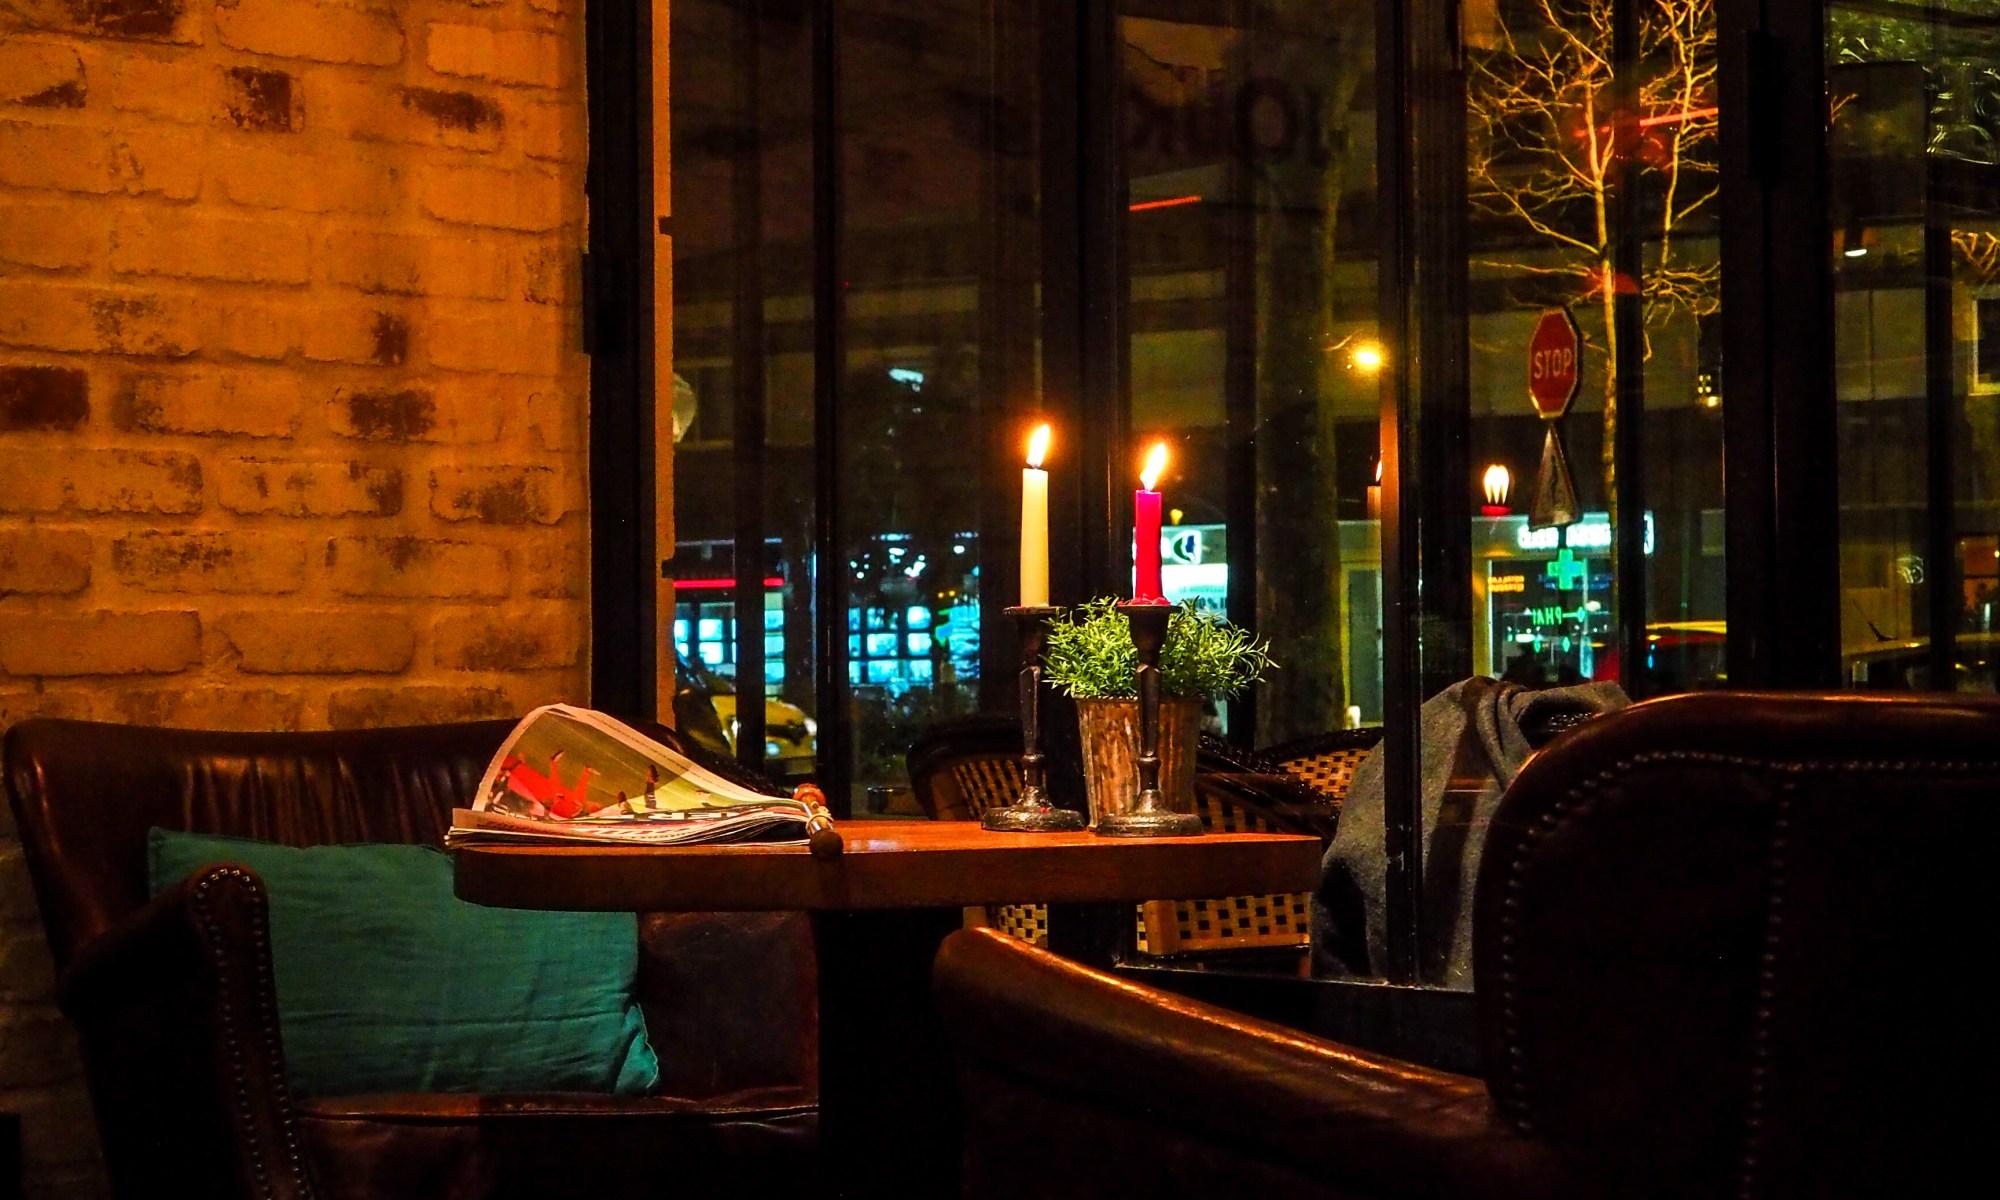 Table, fauteuils, bougies, bar, restaurant, La Place, Neuilly